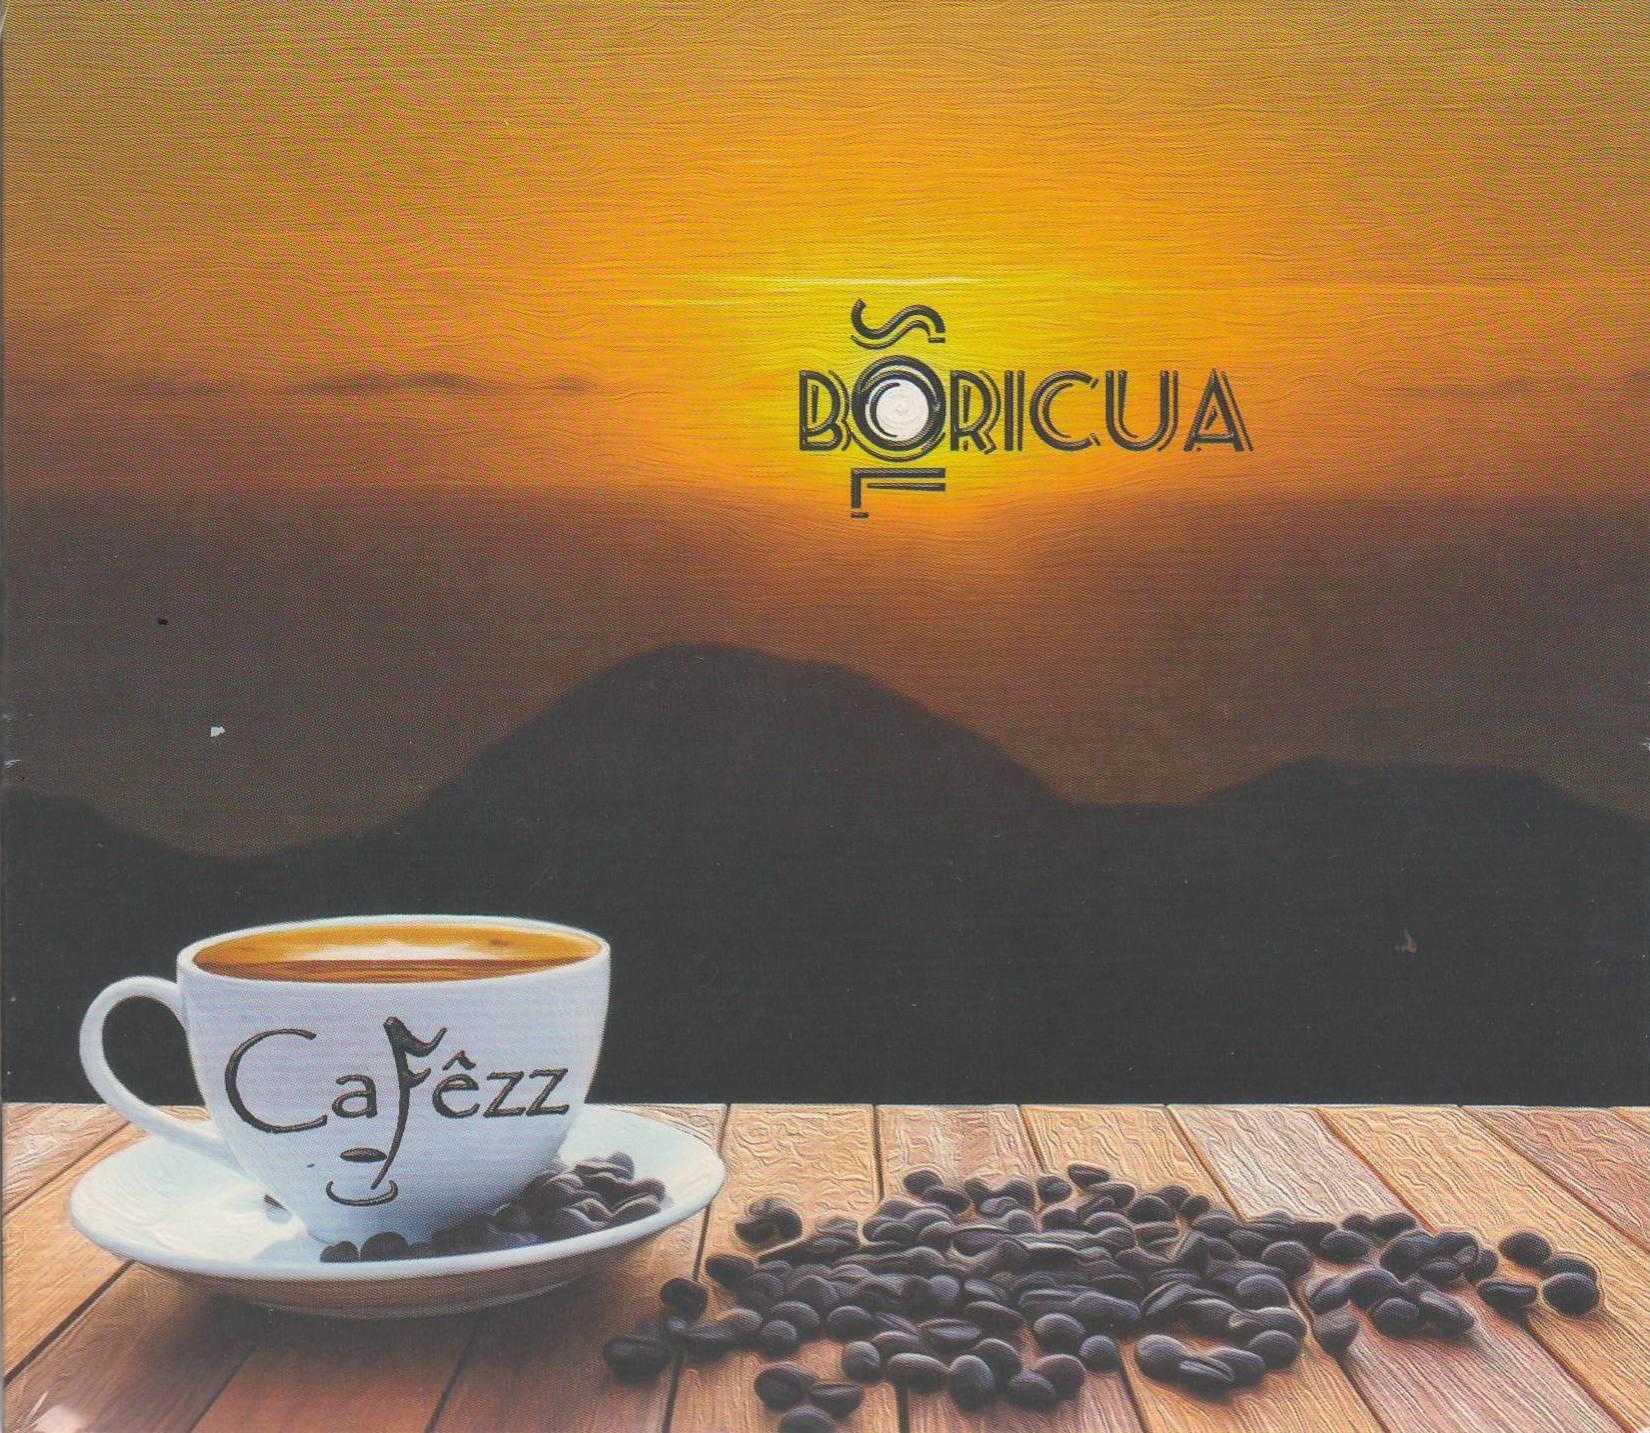 cafezz - 2016 - Sol boricua